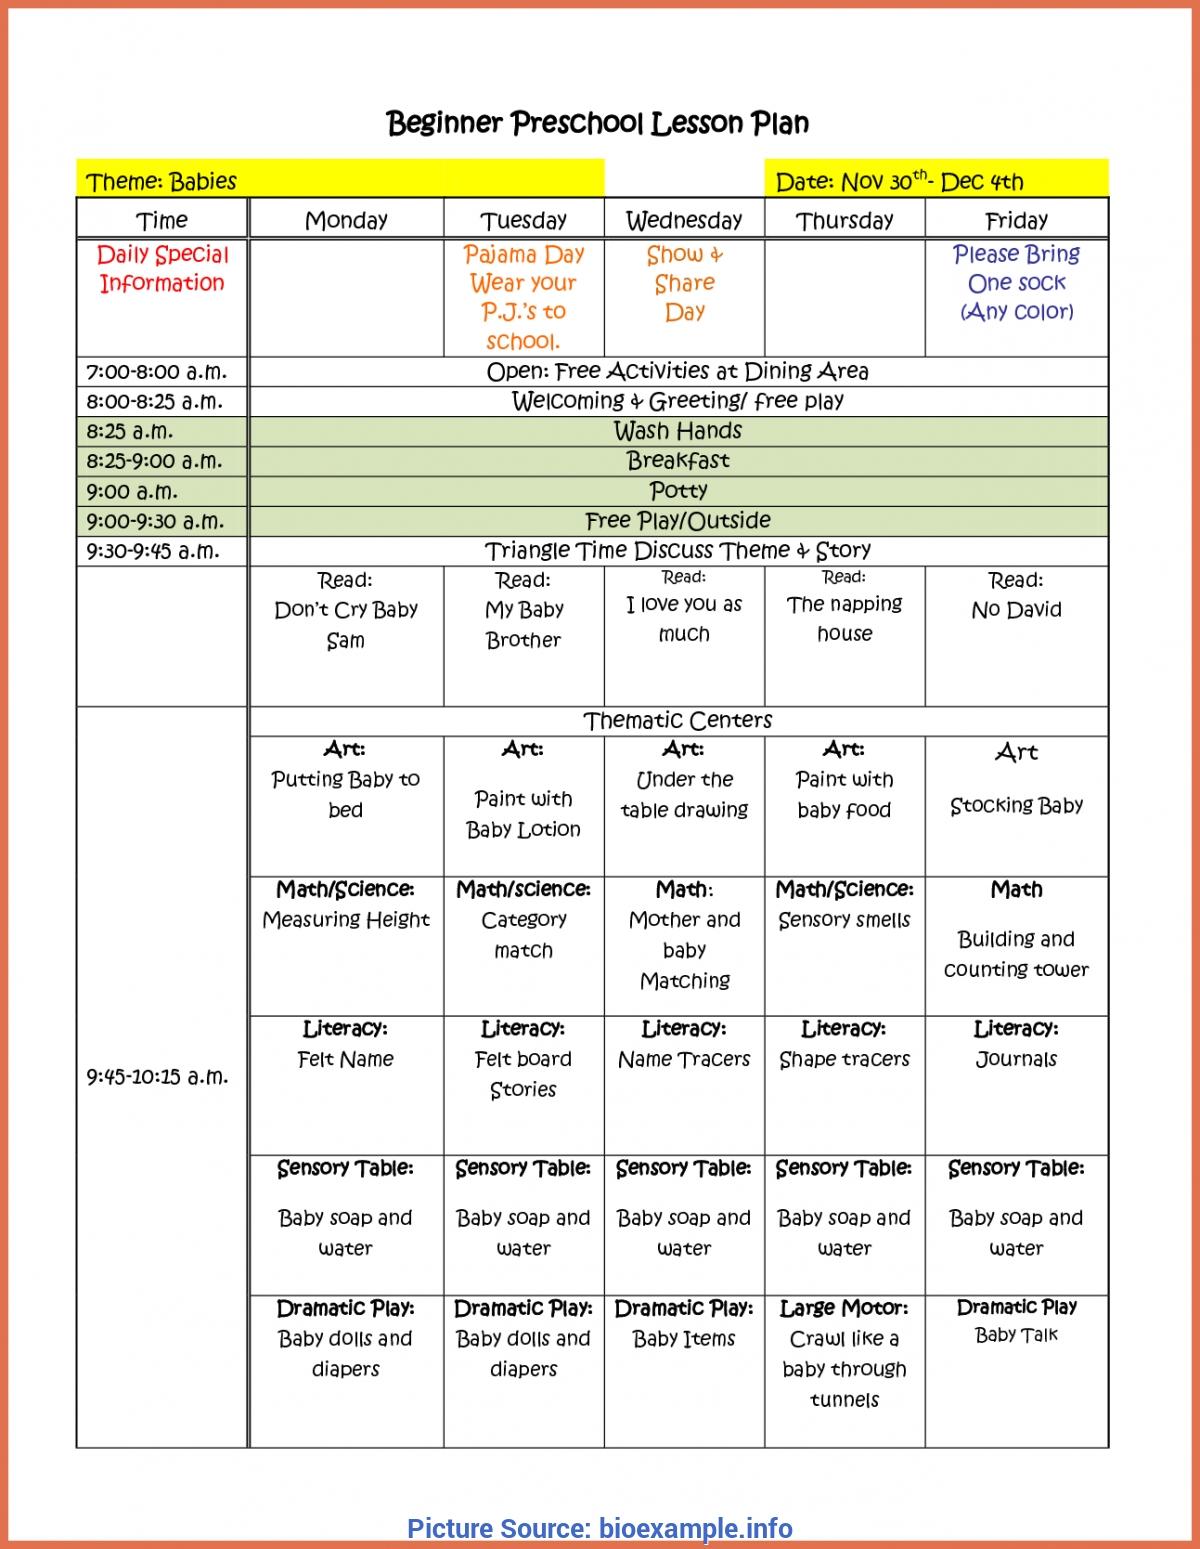 Briliant Preschool Weekly Themes For The Year Summer Camp